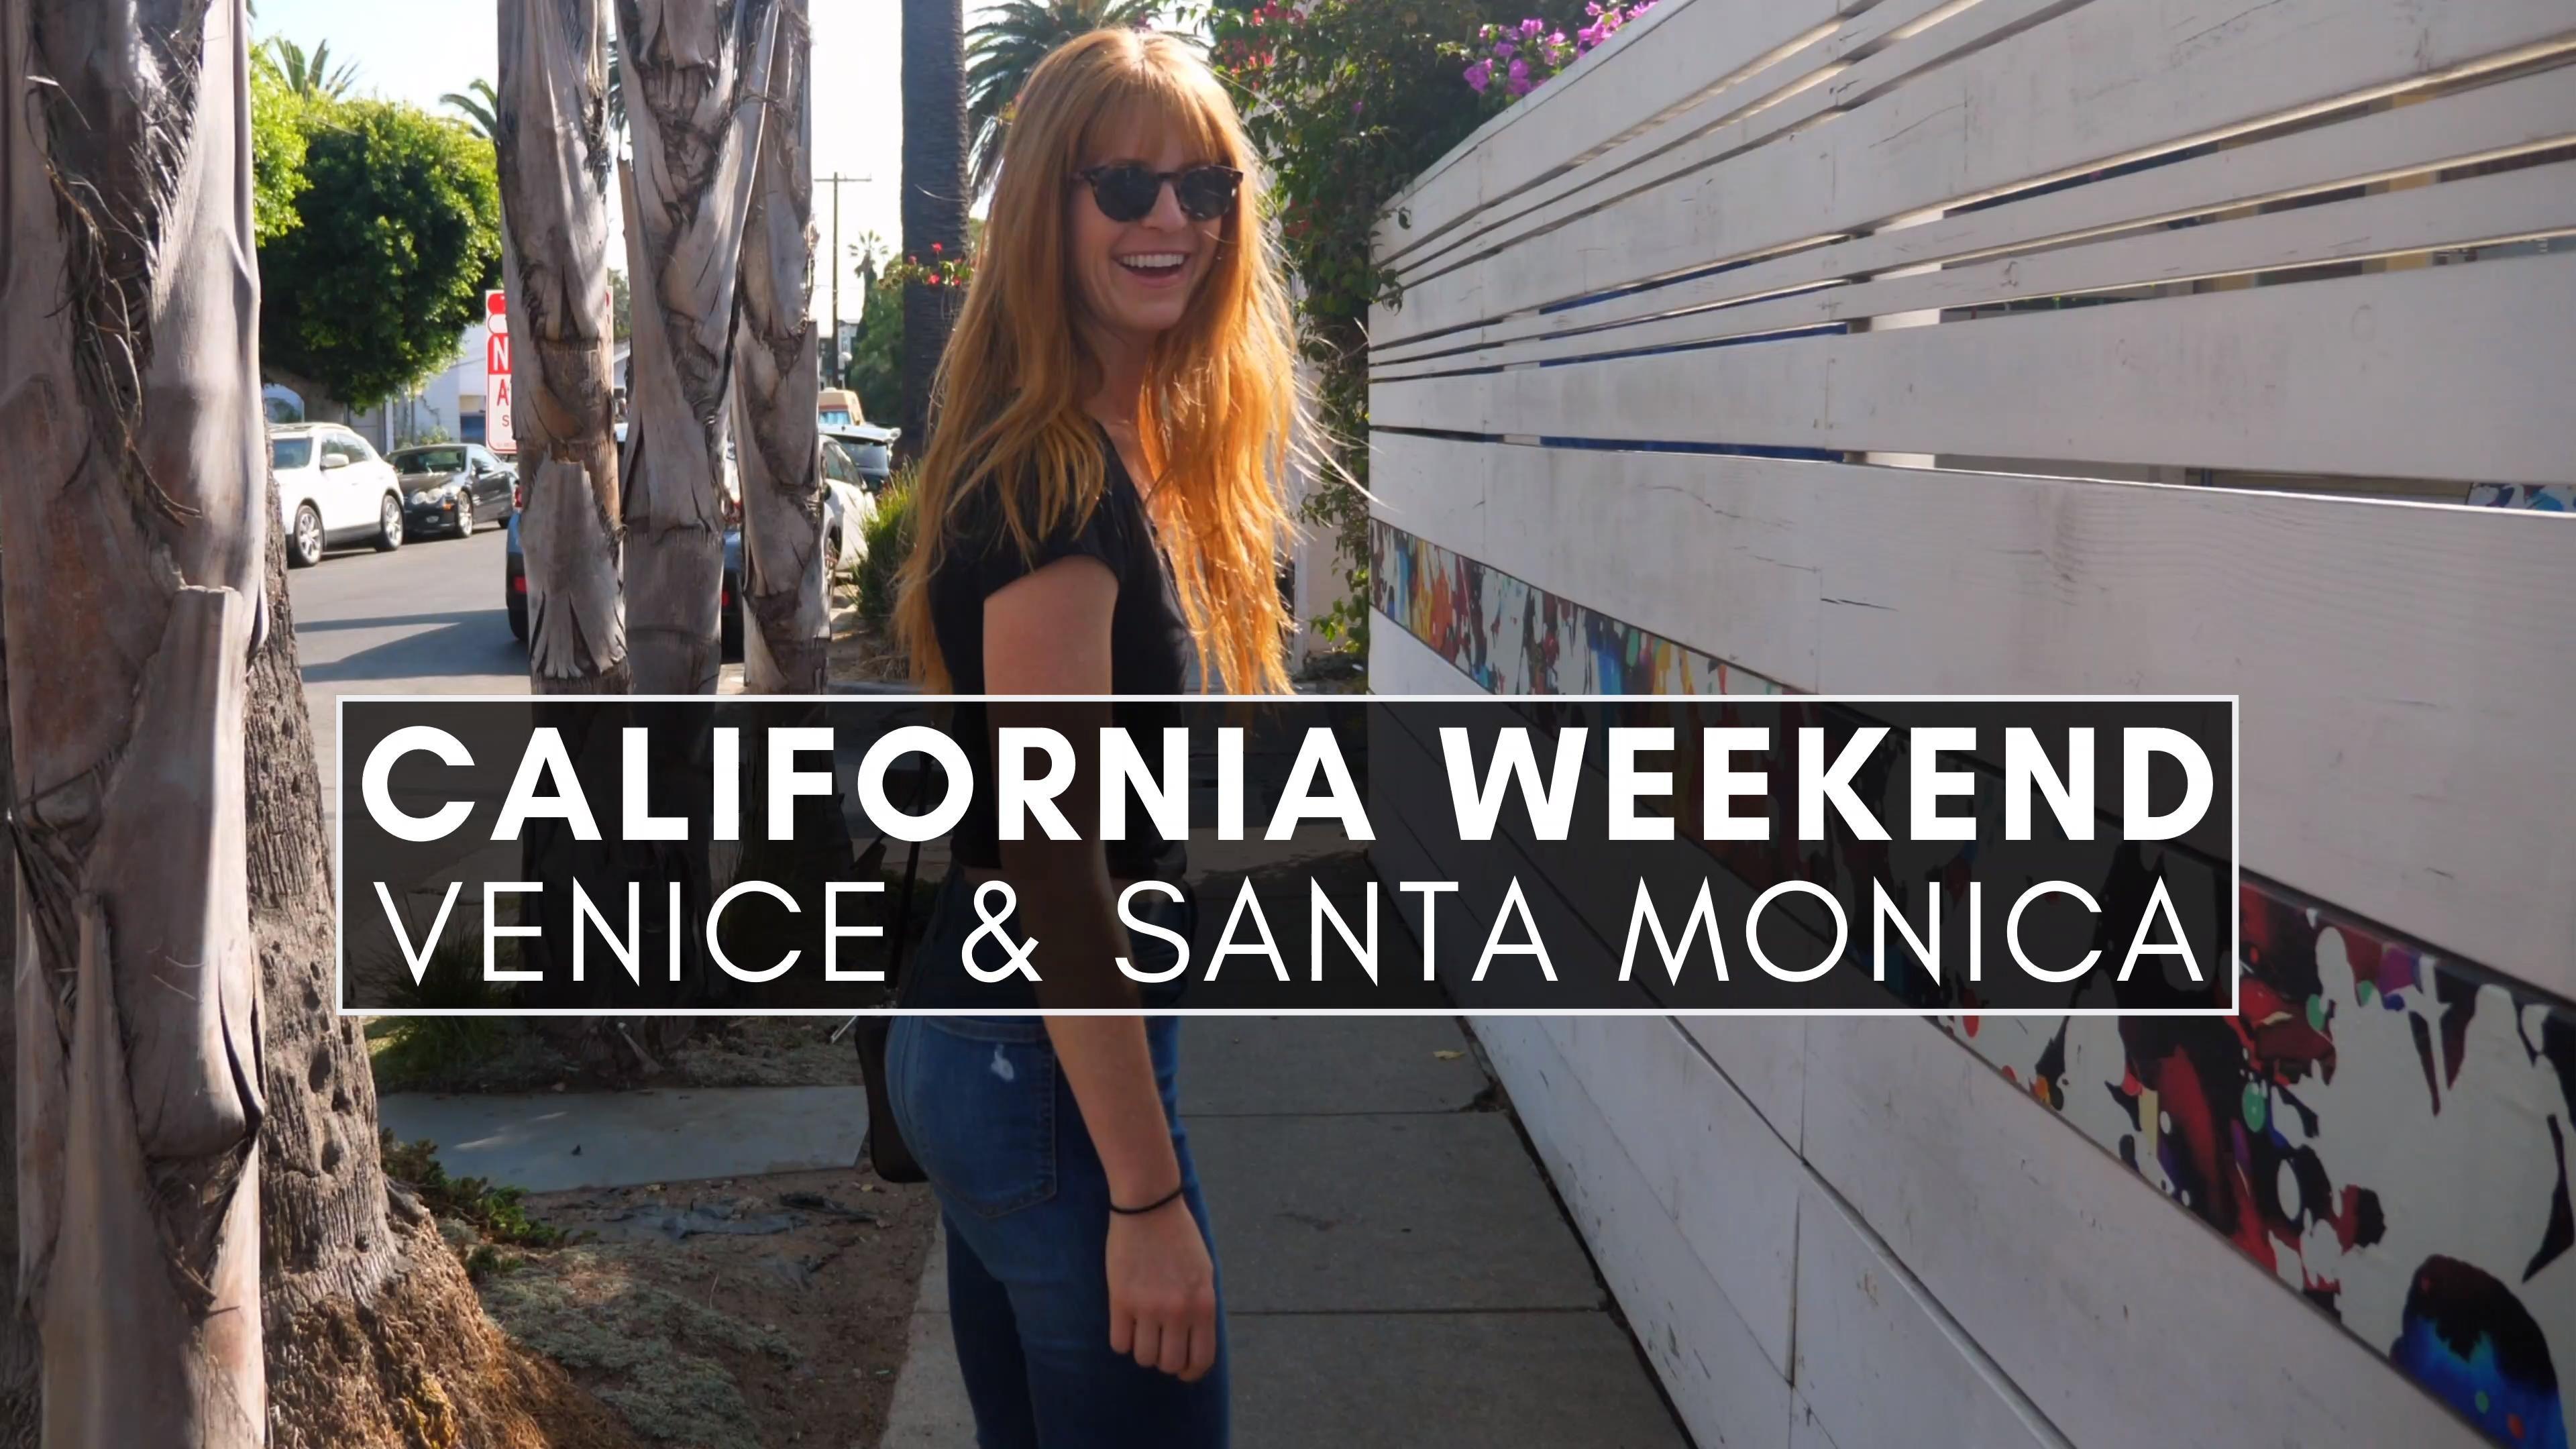 We explored Santa Monica & Venice, as well as the beaches & Abbot Kinney Blvd.    #santamonica #venicebeach #beverlyhills #santamonicapier #westhollywood #hollywoodhills #culvercity #santamonicabeach #hermosabeach #hollywood #marinadelrey #malibu #calabasas #dtla #hollywoodlife #californiadreaming #lalife #westwood #la #manhattanbeach #silverlake #losangeles_la #californialiving #brentwood #pacificpalisades #woodlandhills #lax #belair #redondobeach #northhollywood